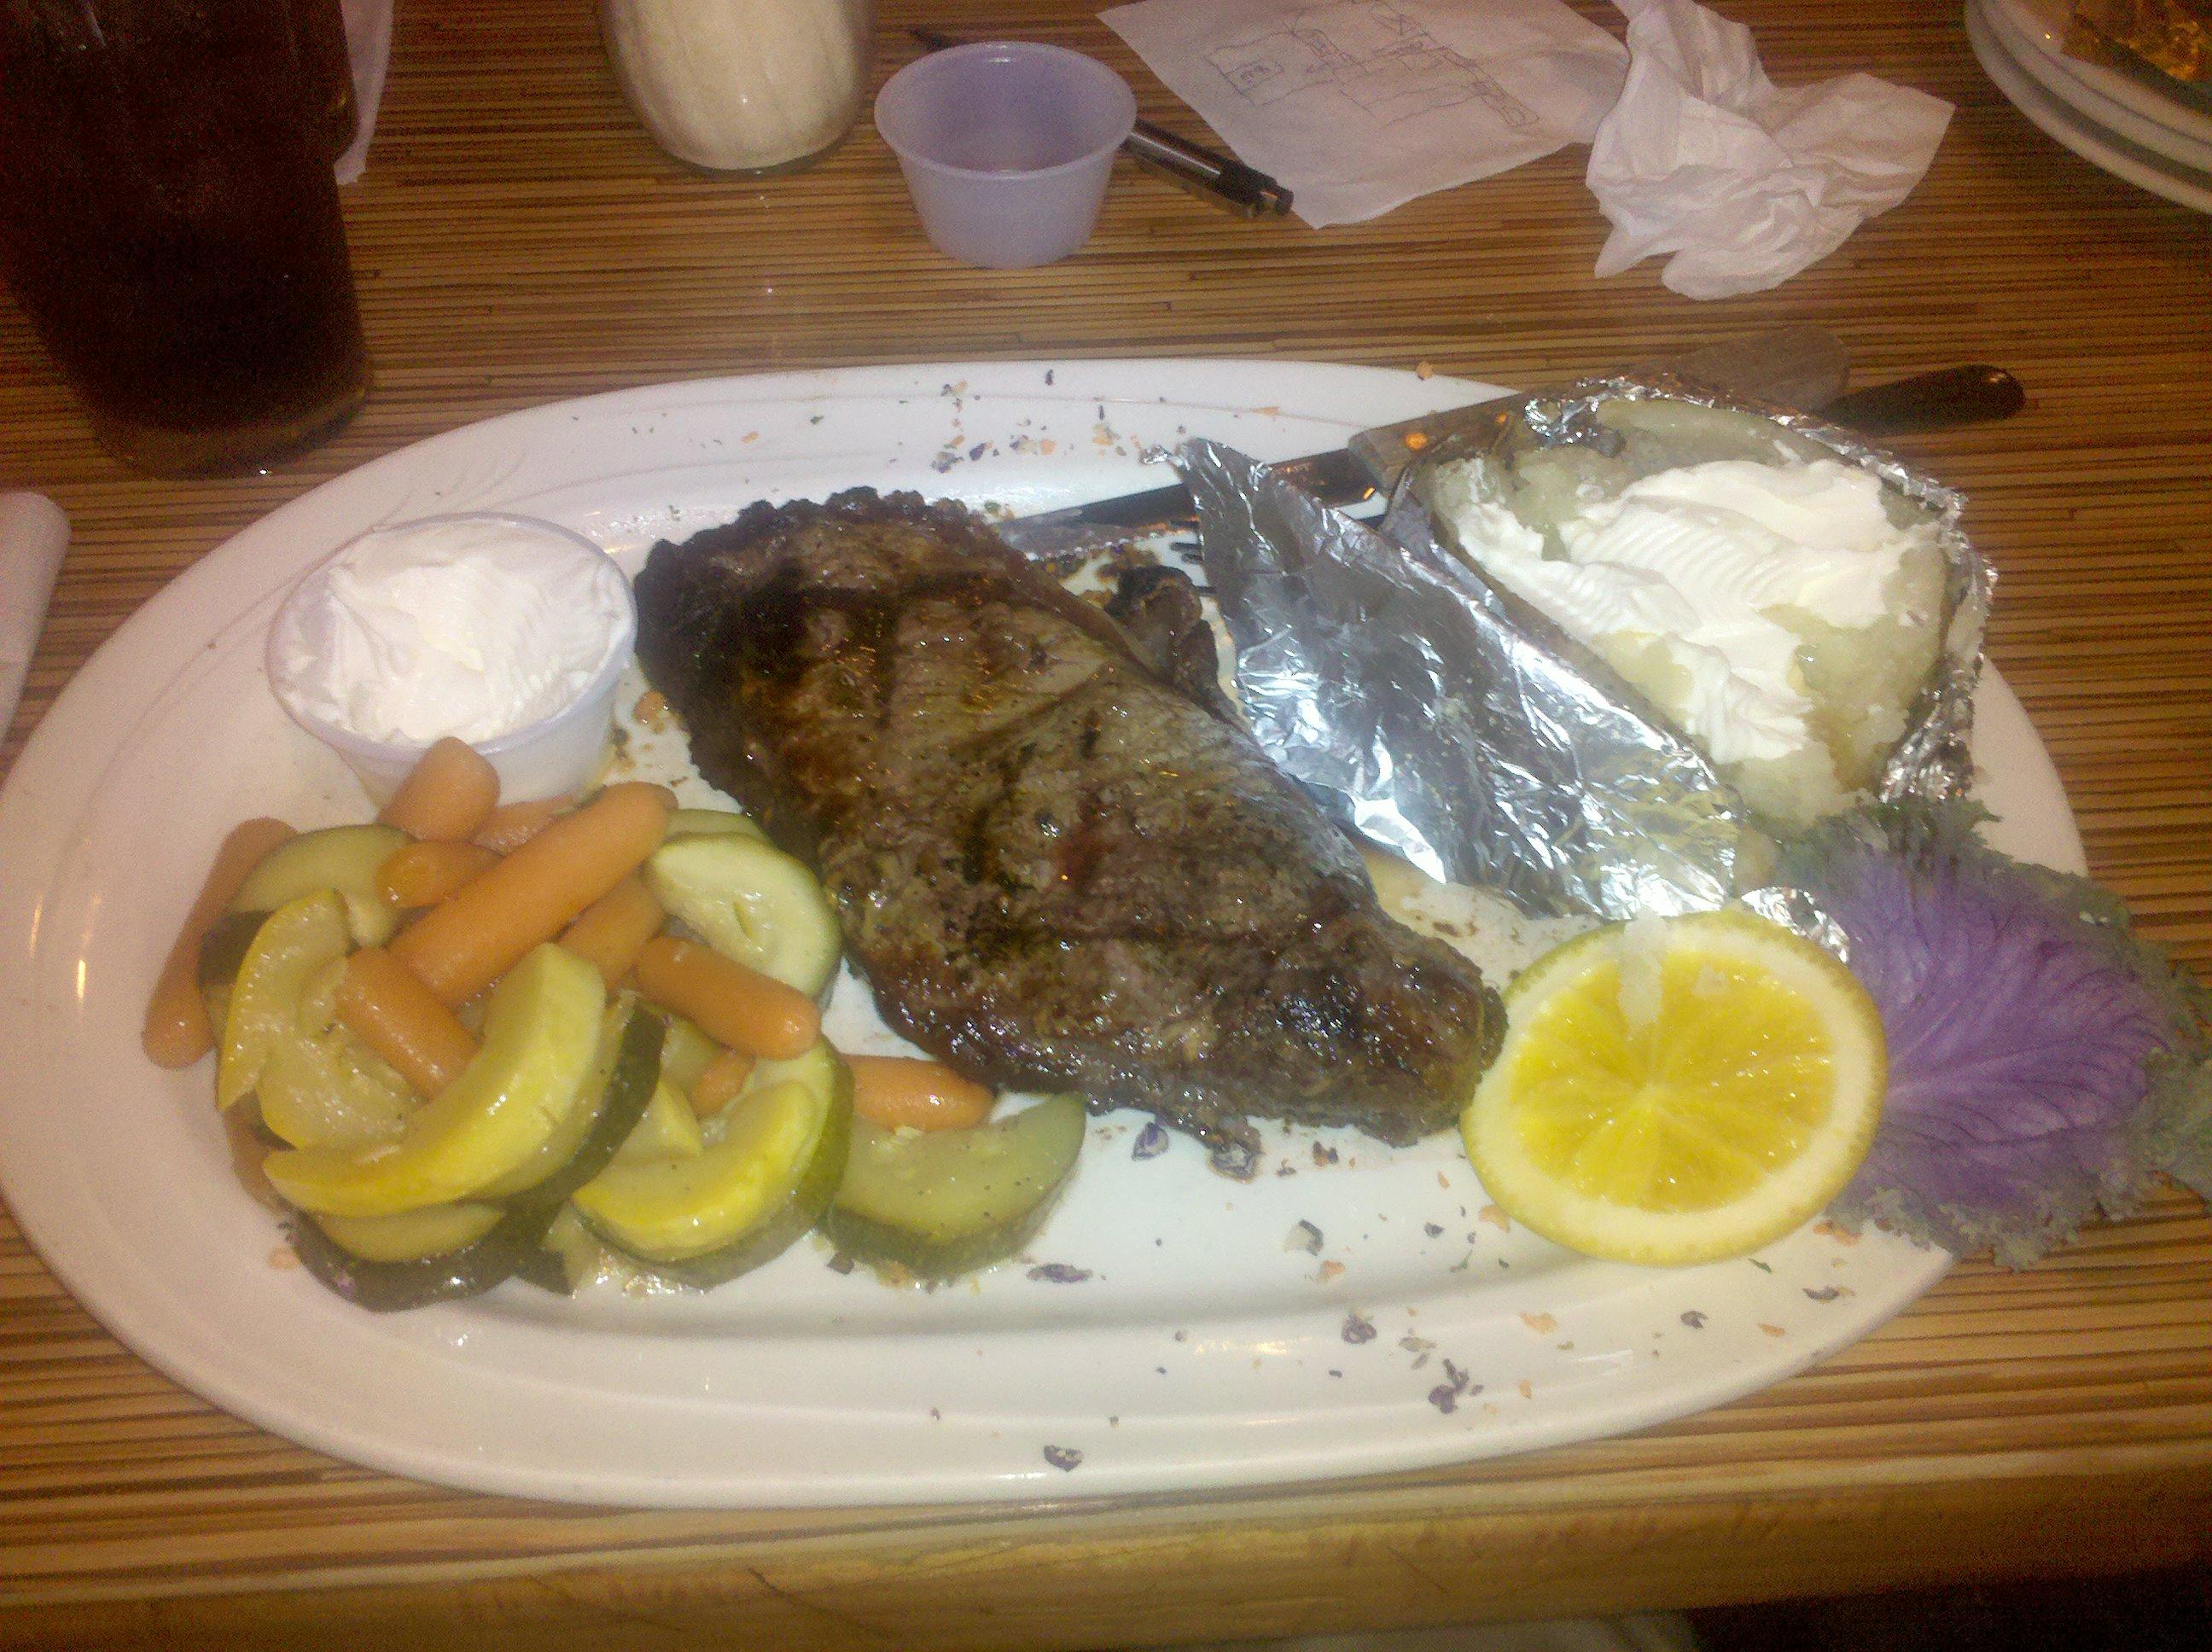 Periwinkles - Auburn MA :: Steak Dinner - very good